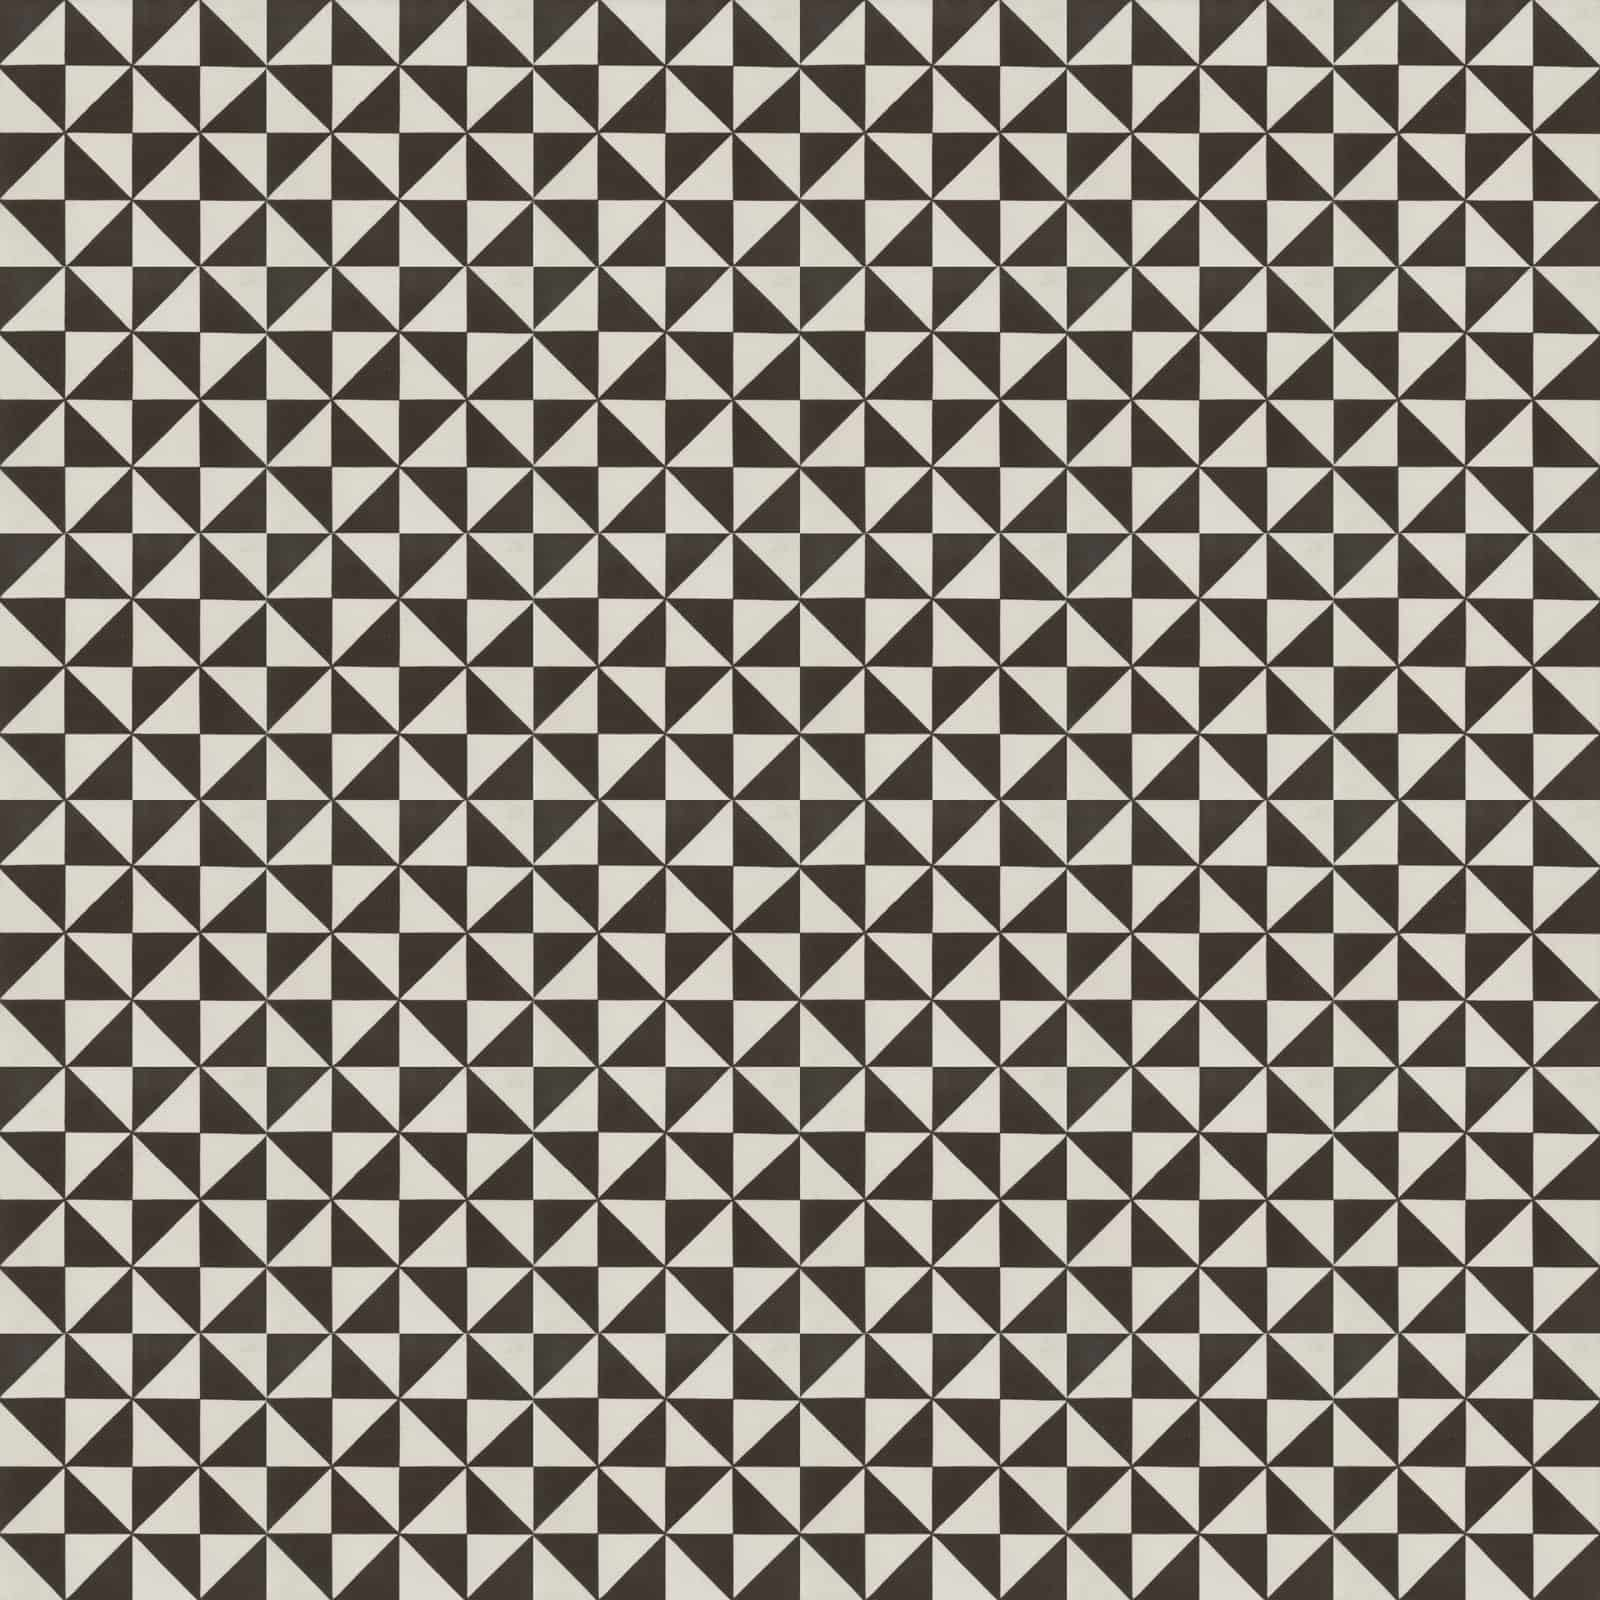 zementfliesen-verlegemuster-nummer-10460-viaplatten | 10460